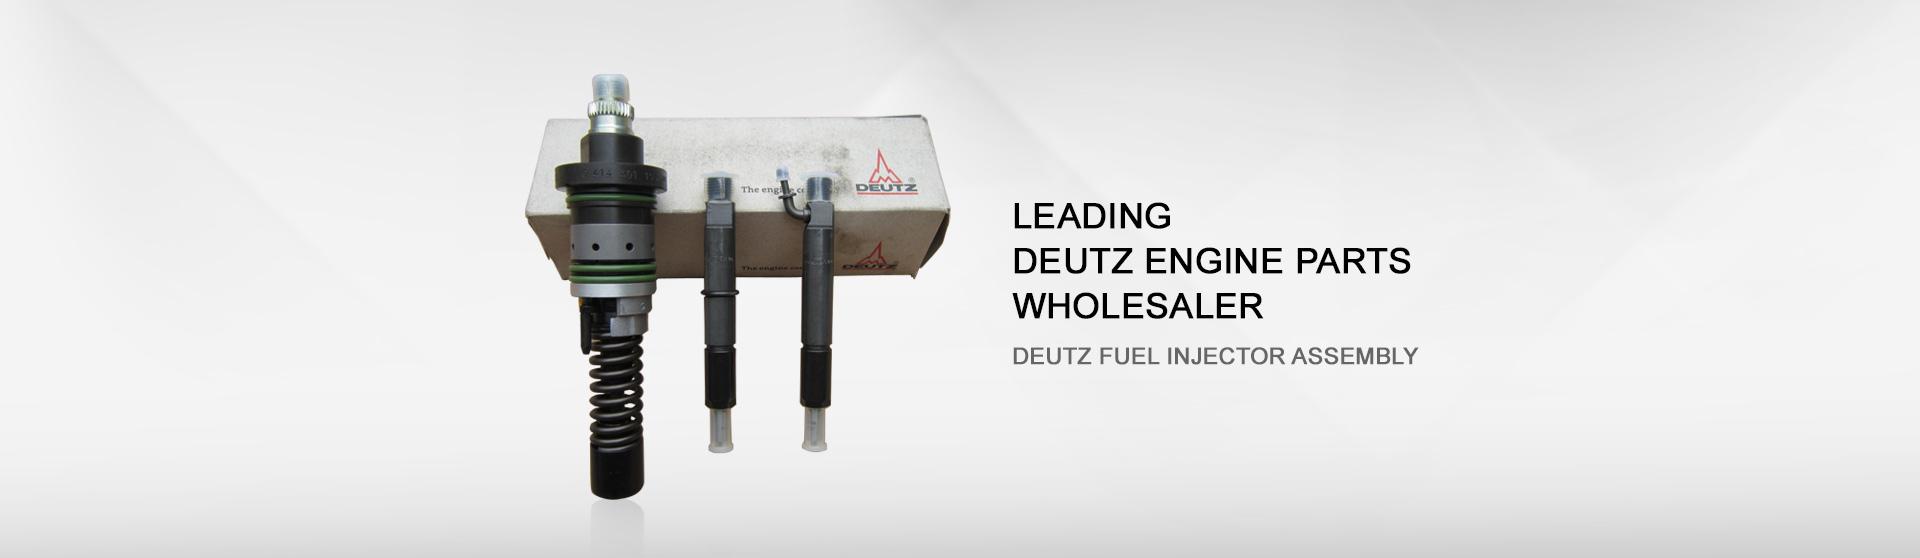 DEUTZ fuel injector assembly